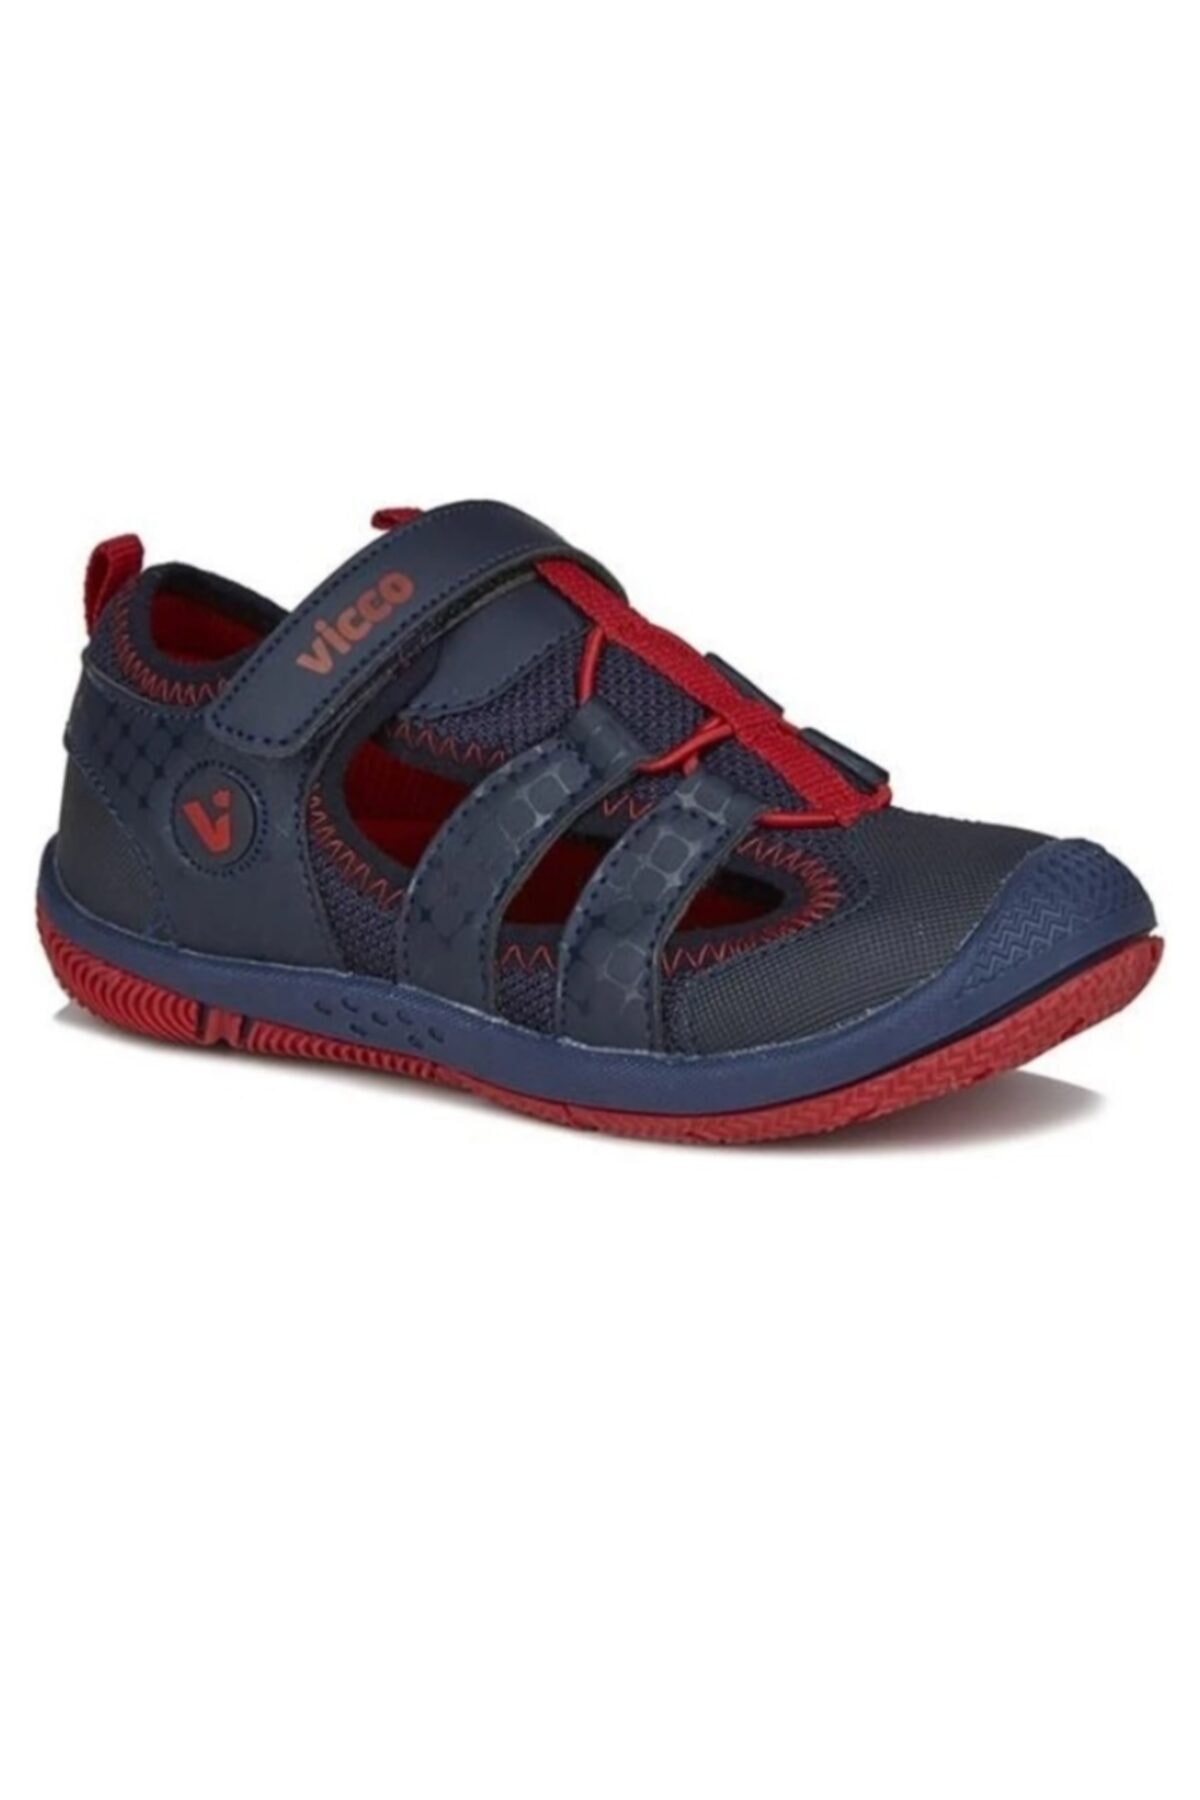 Vicco Ortapedik Sandalet 1